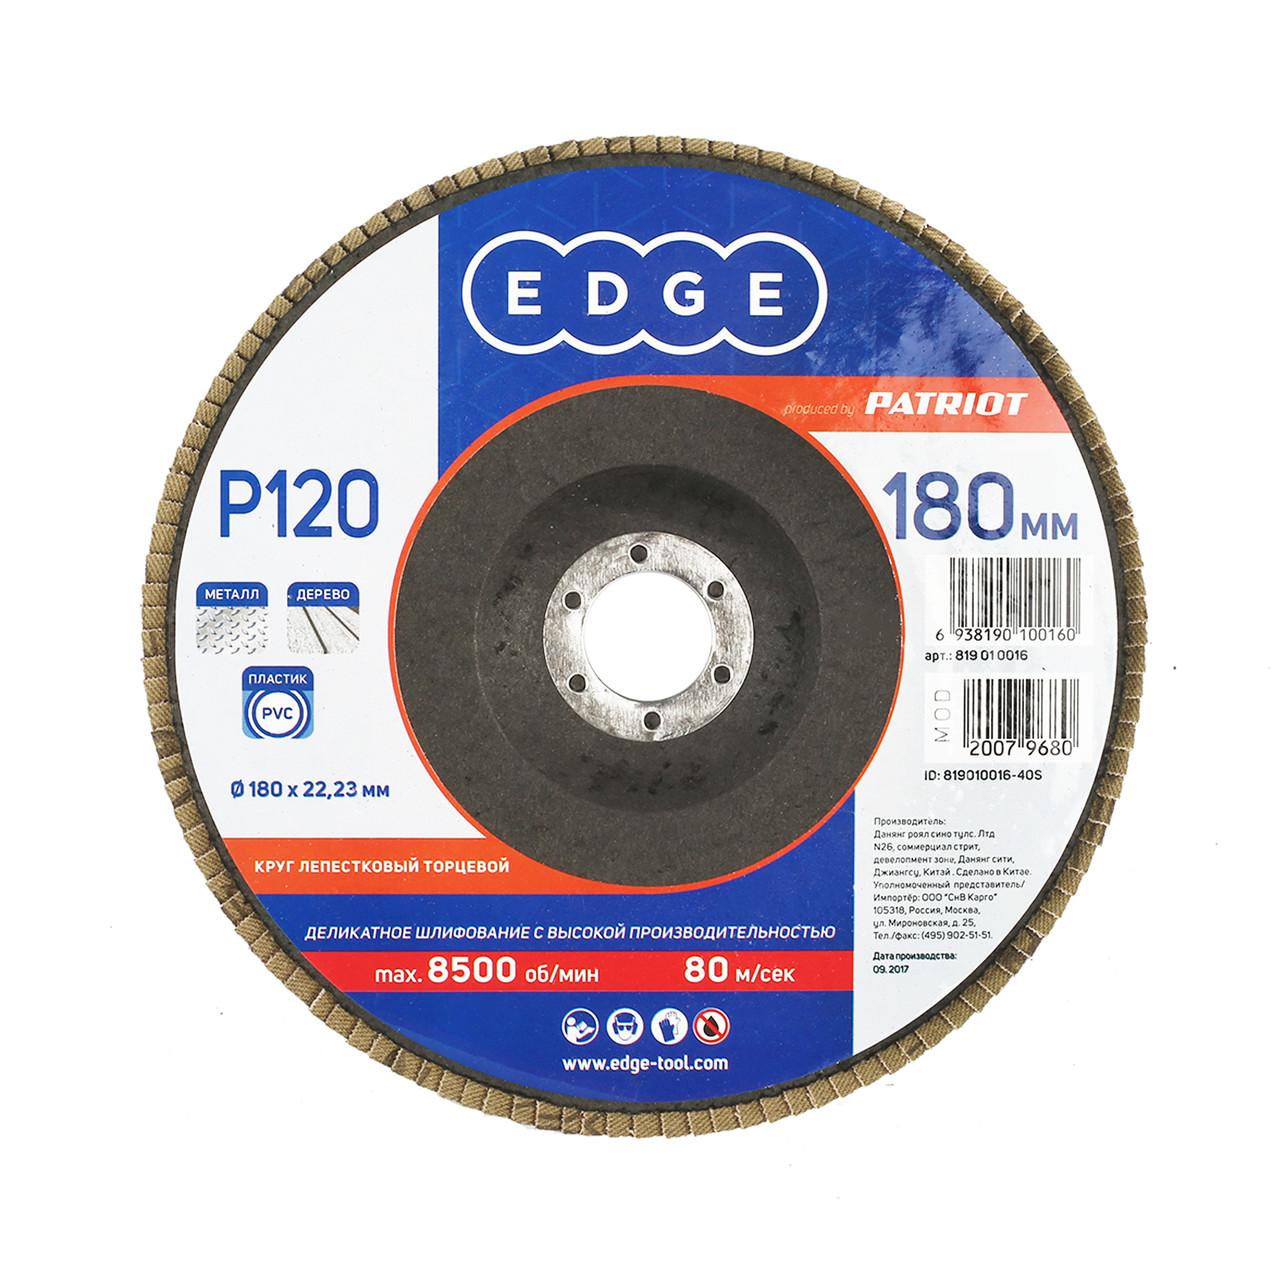 КЛТ Edge by Patriot 180мм*22,23мм*P120